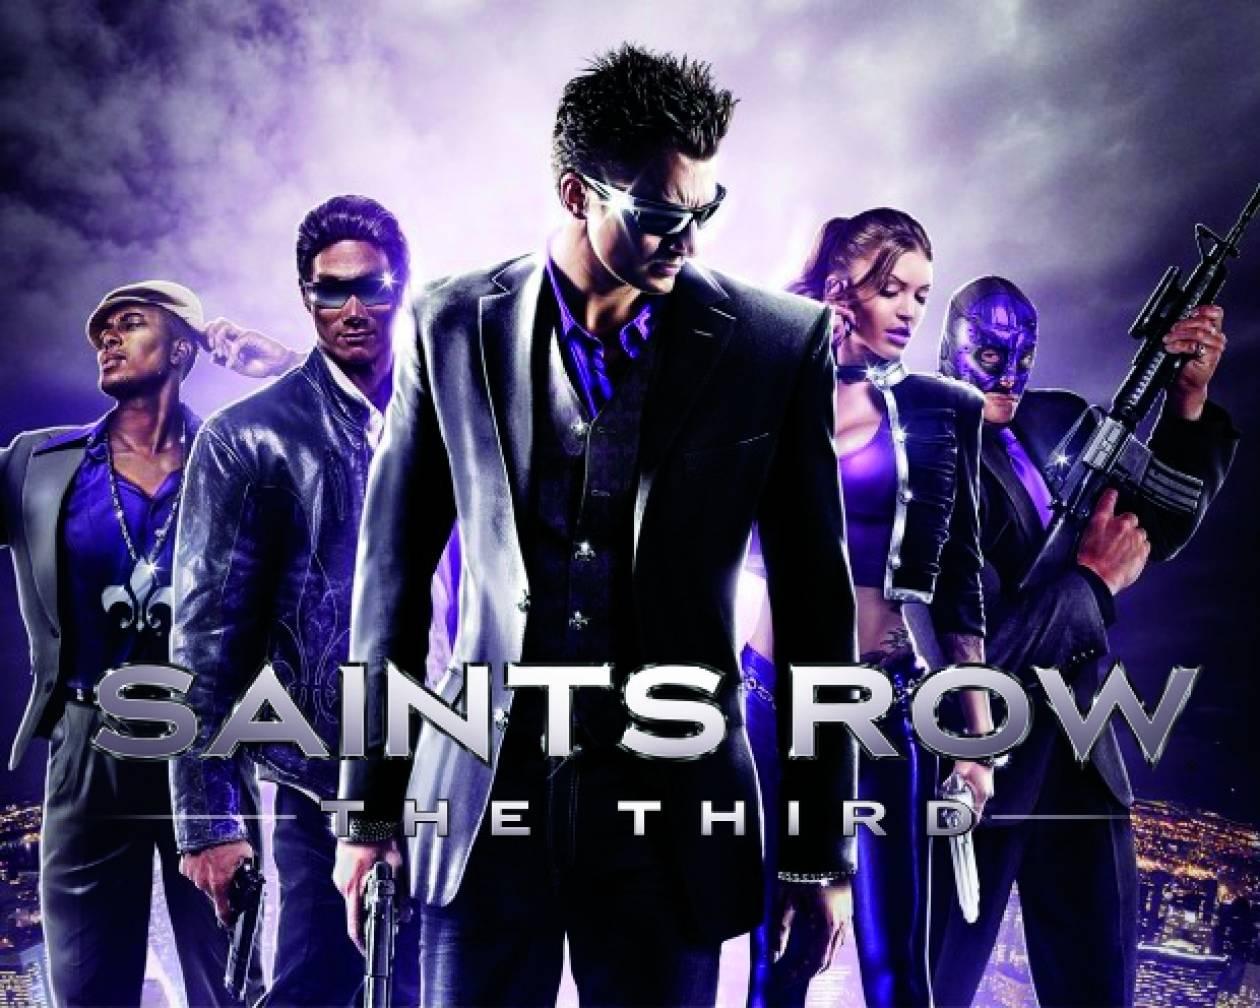 Saints Row The Third: Το πιο τρελό videogame που έχει κυκλοφορήσει